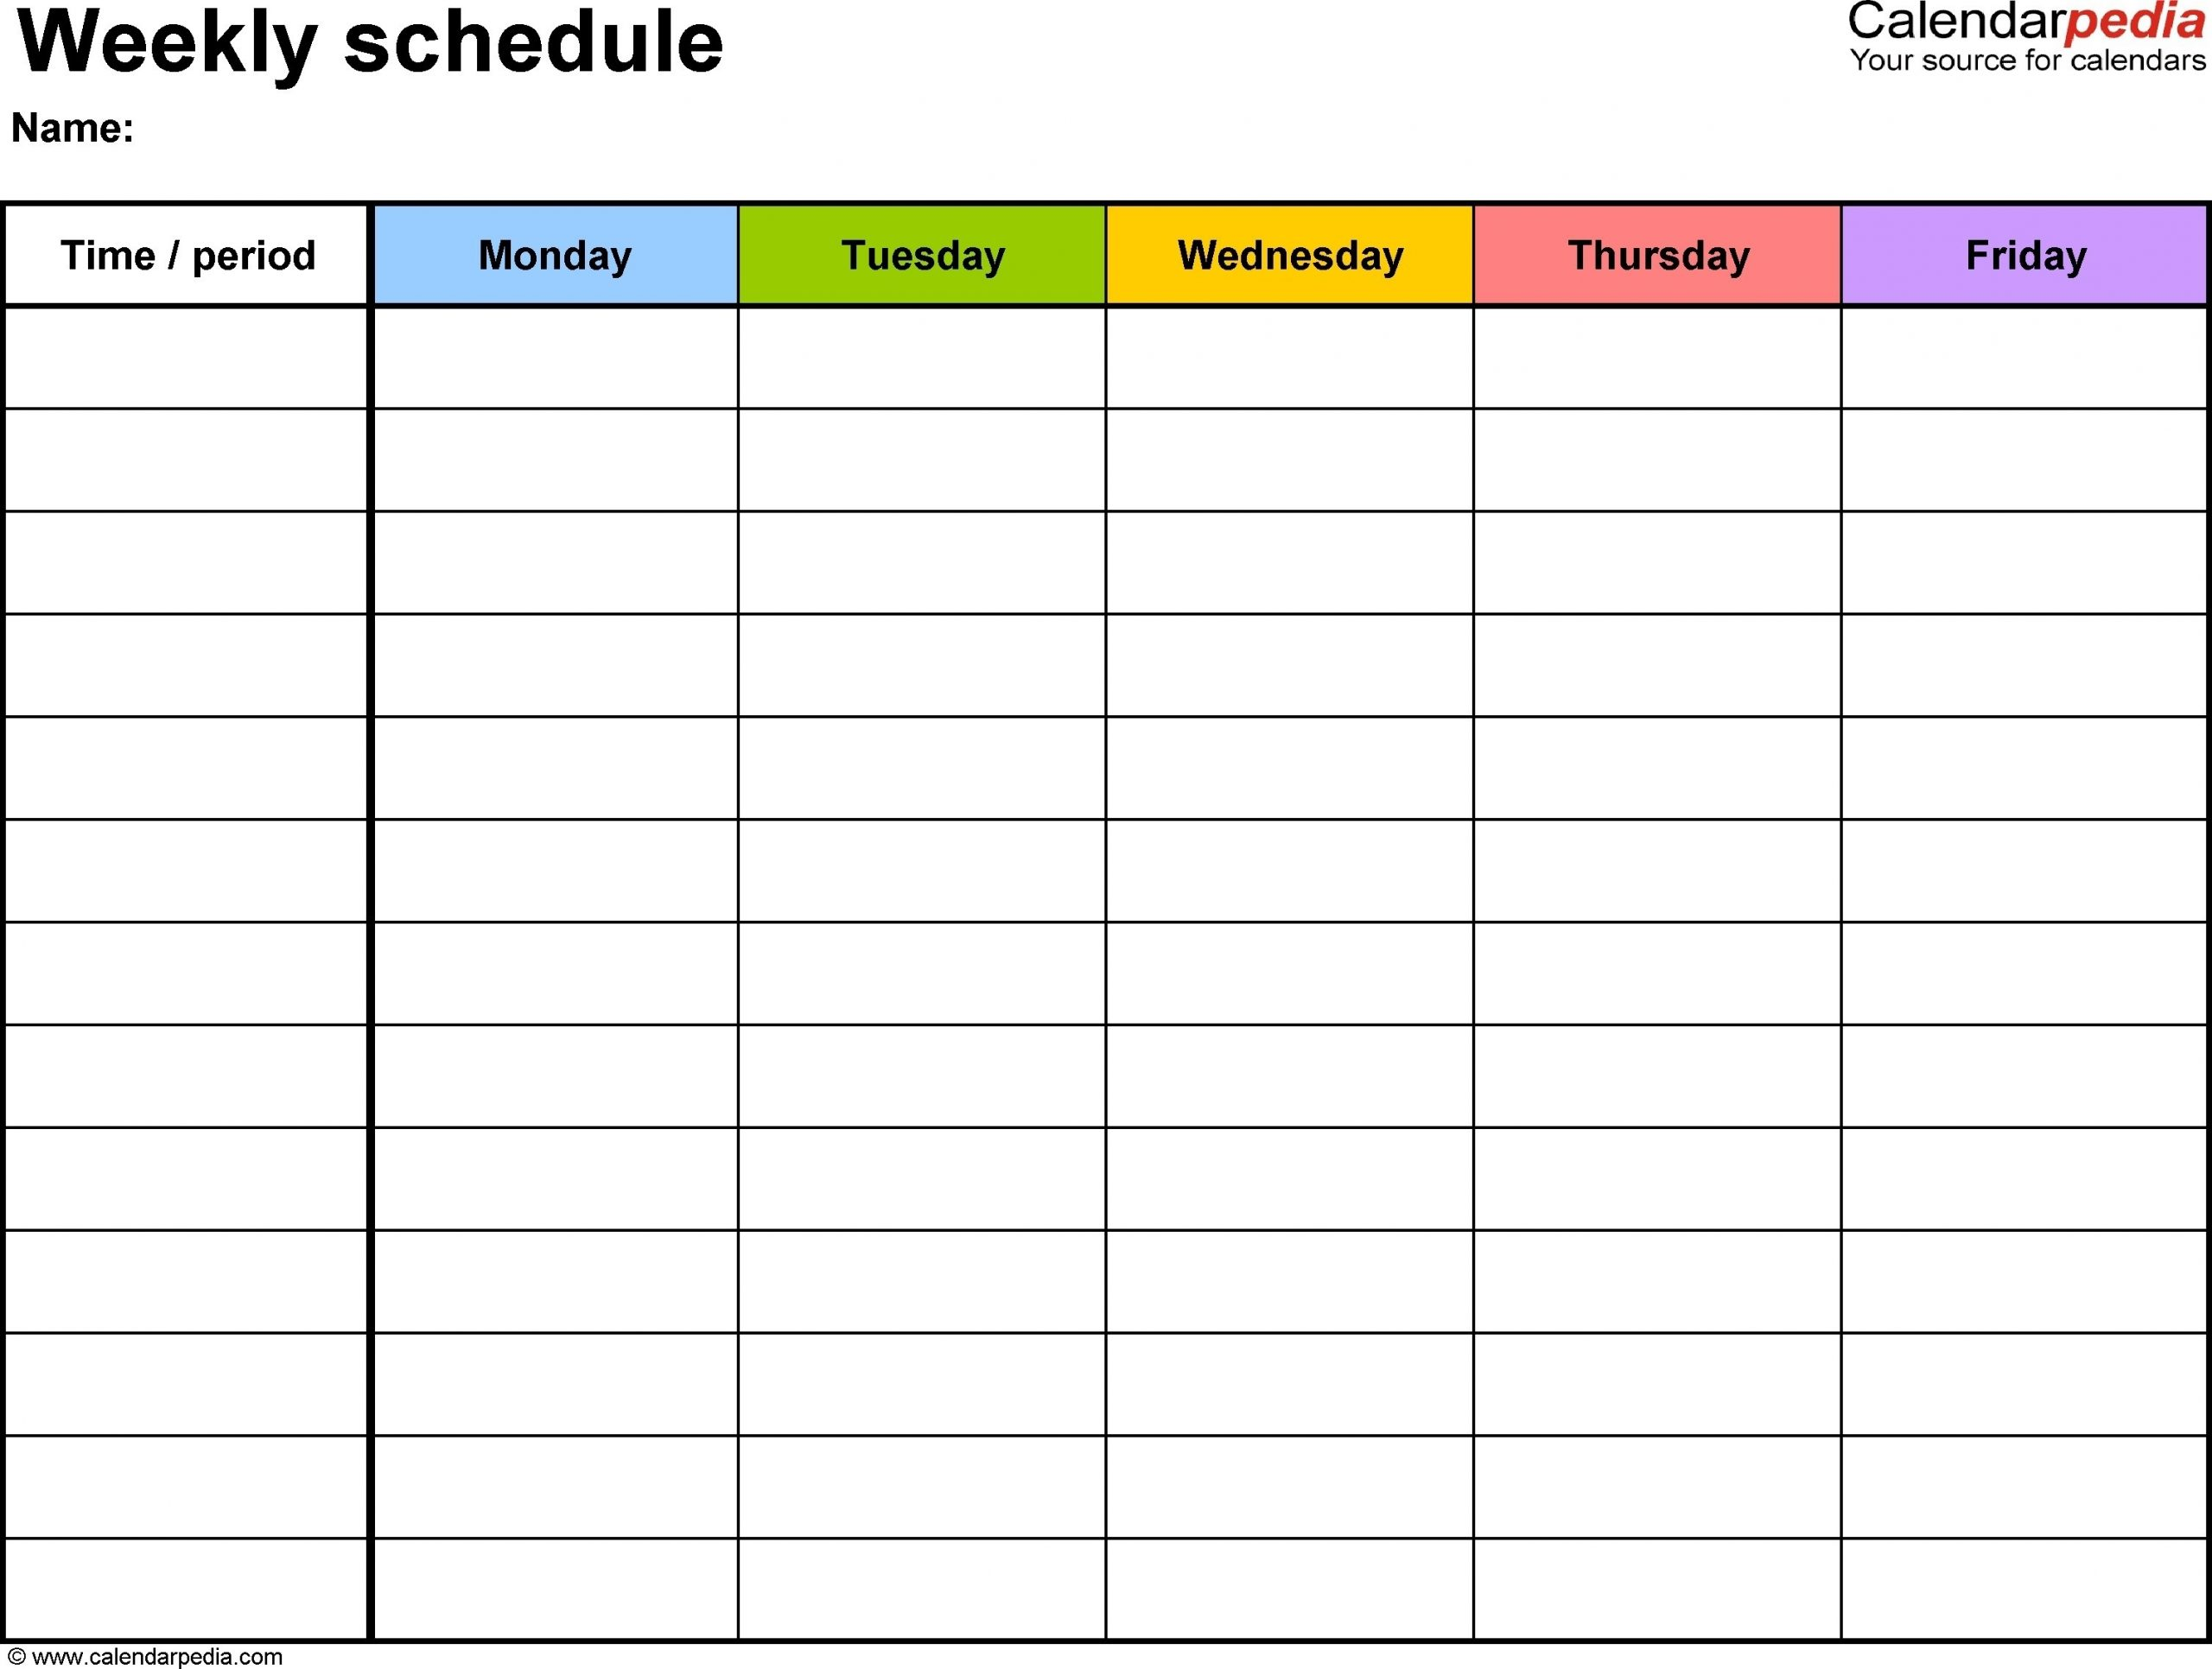 Blank Calendar With Time Slots | Example Calendar Printable